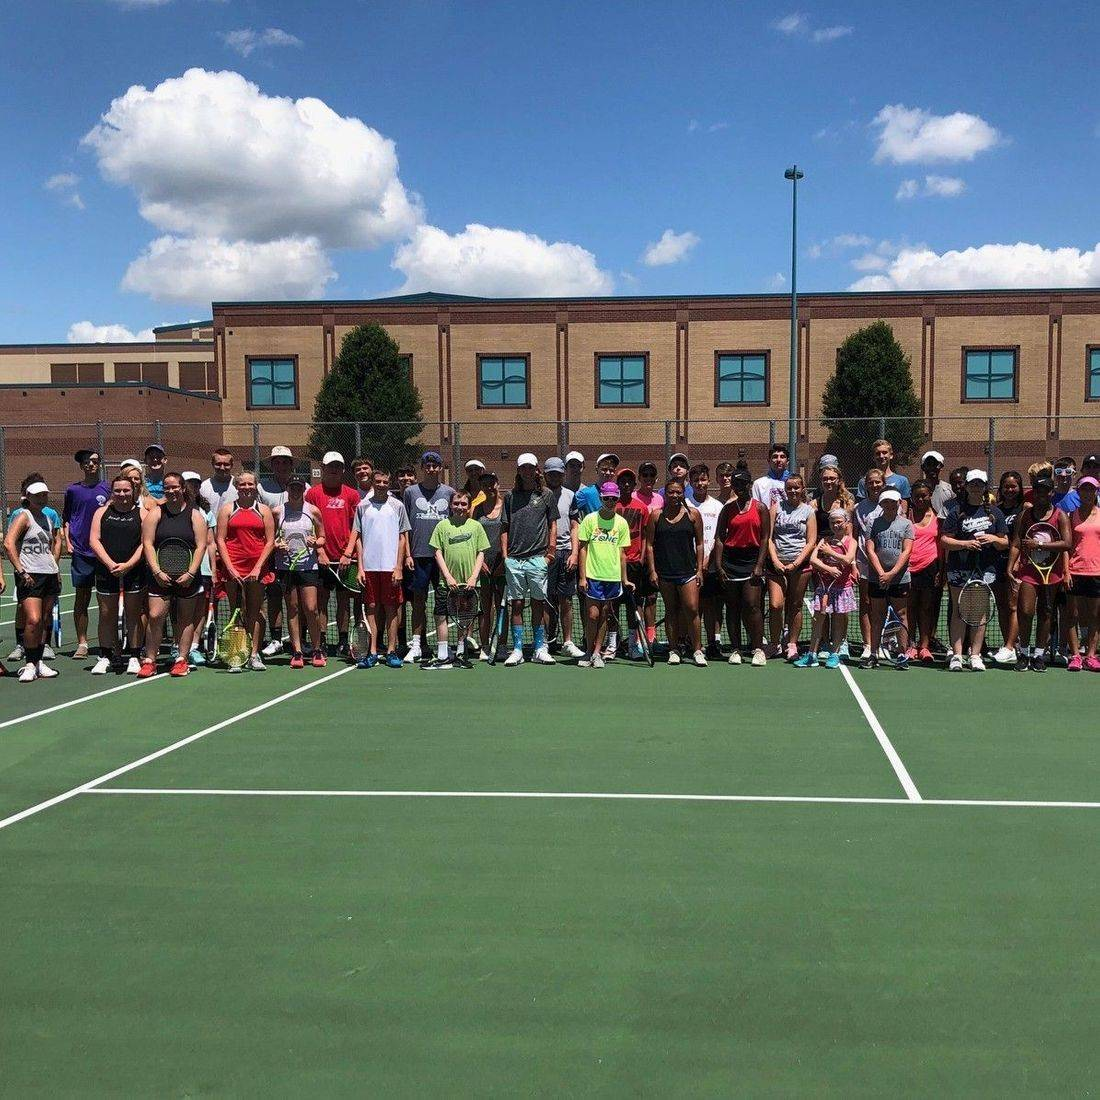 Avon & Terre Haute Match Day Pict 1